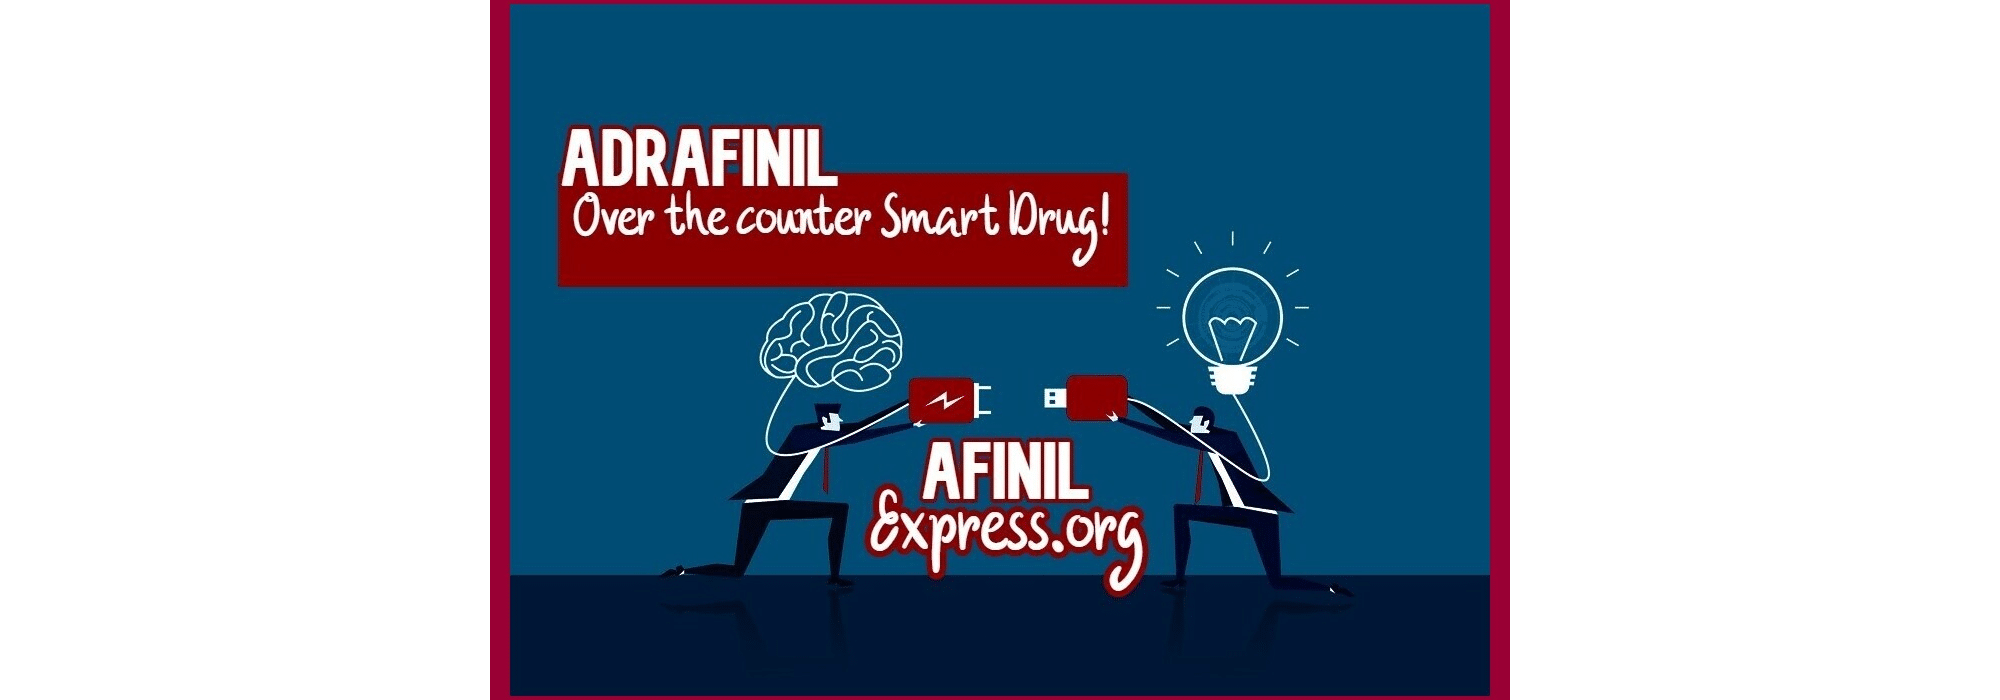 adrafinil express